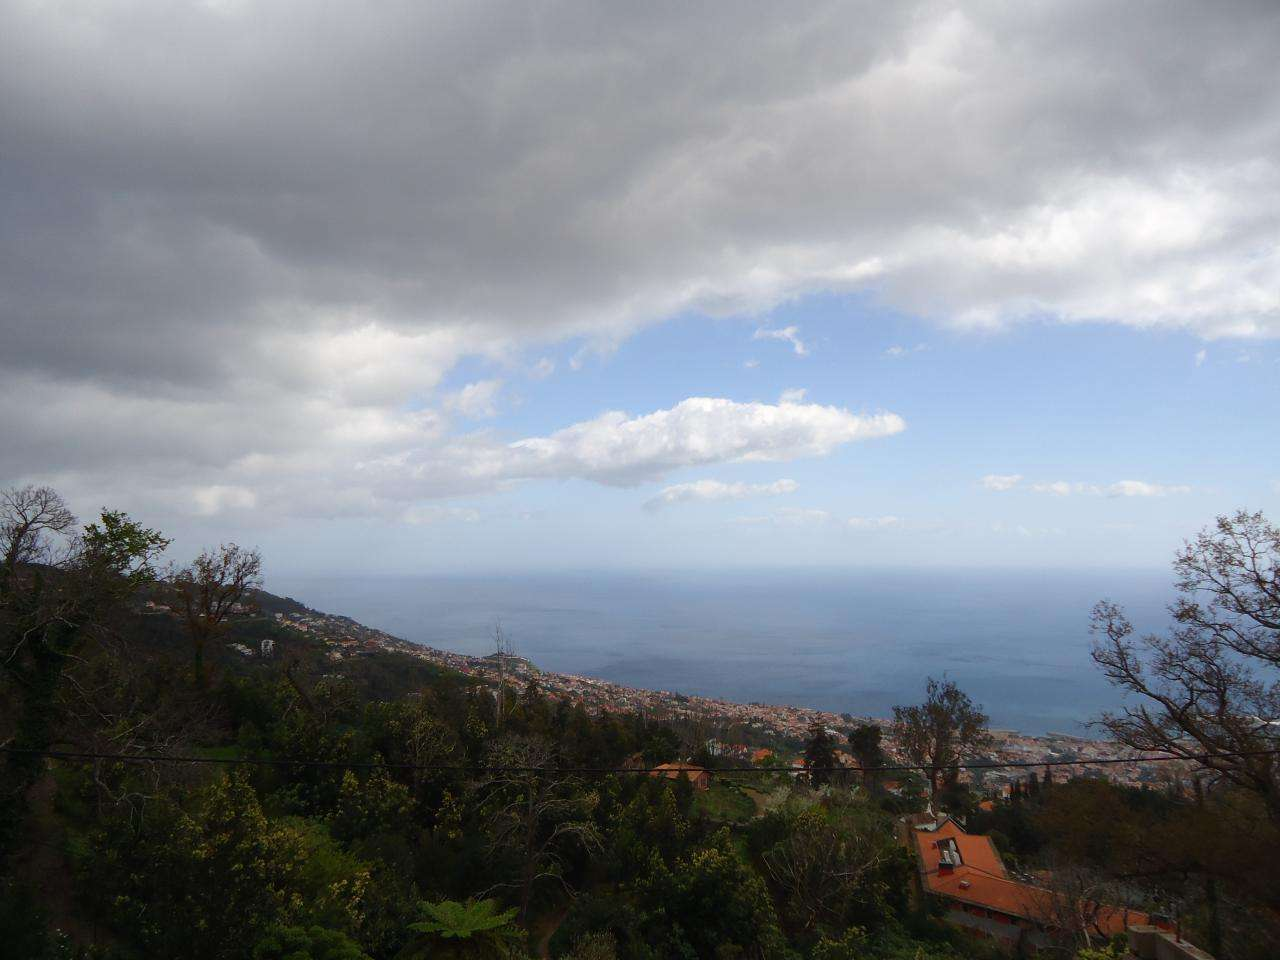 Moradia para comprar, Monte, Funchal, Ilha da Madeira - Foto 17